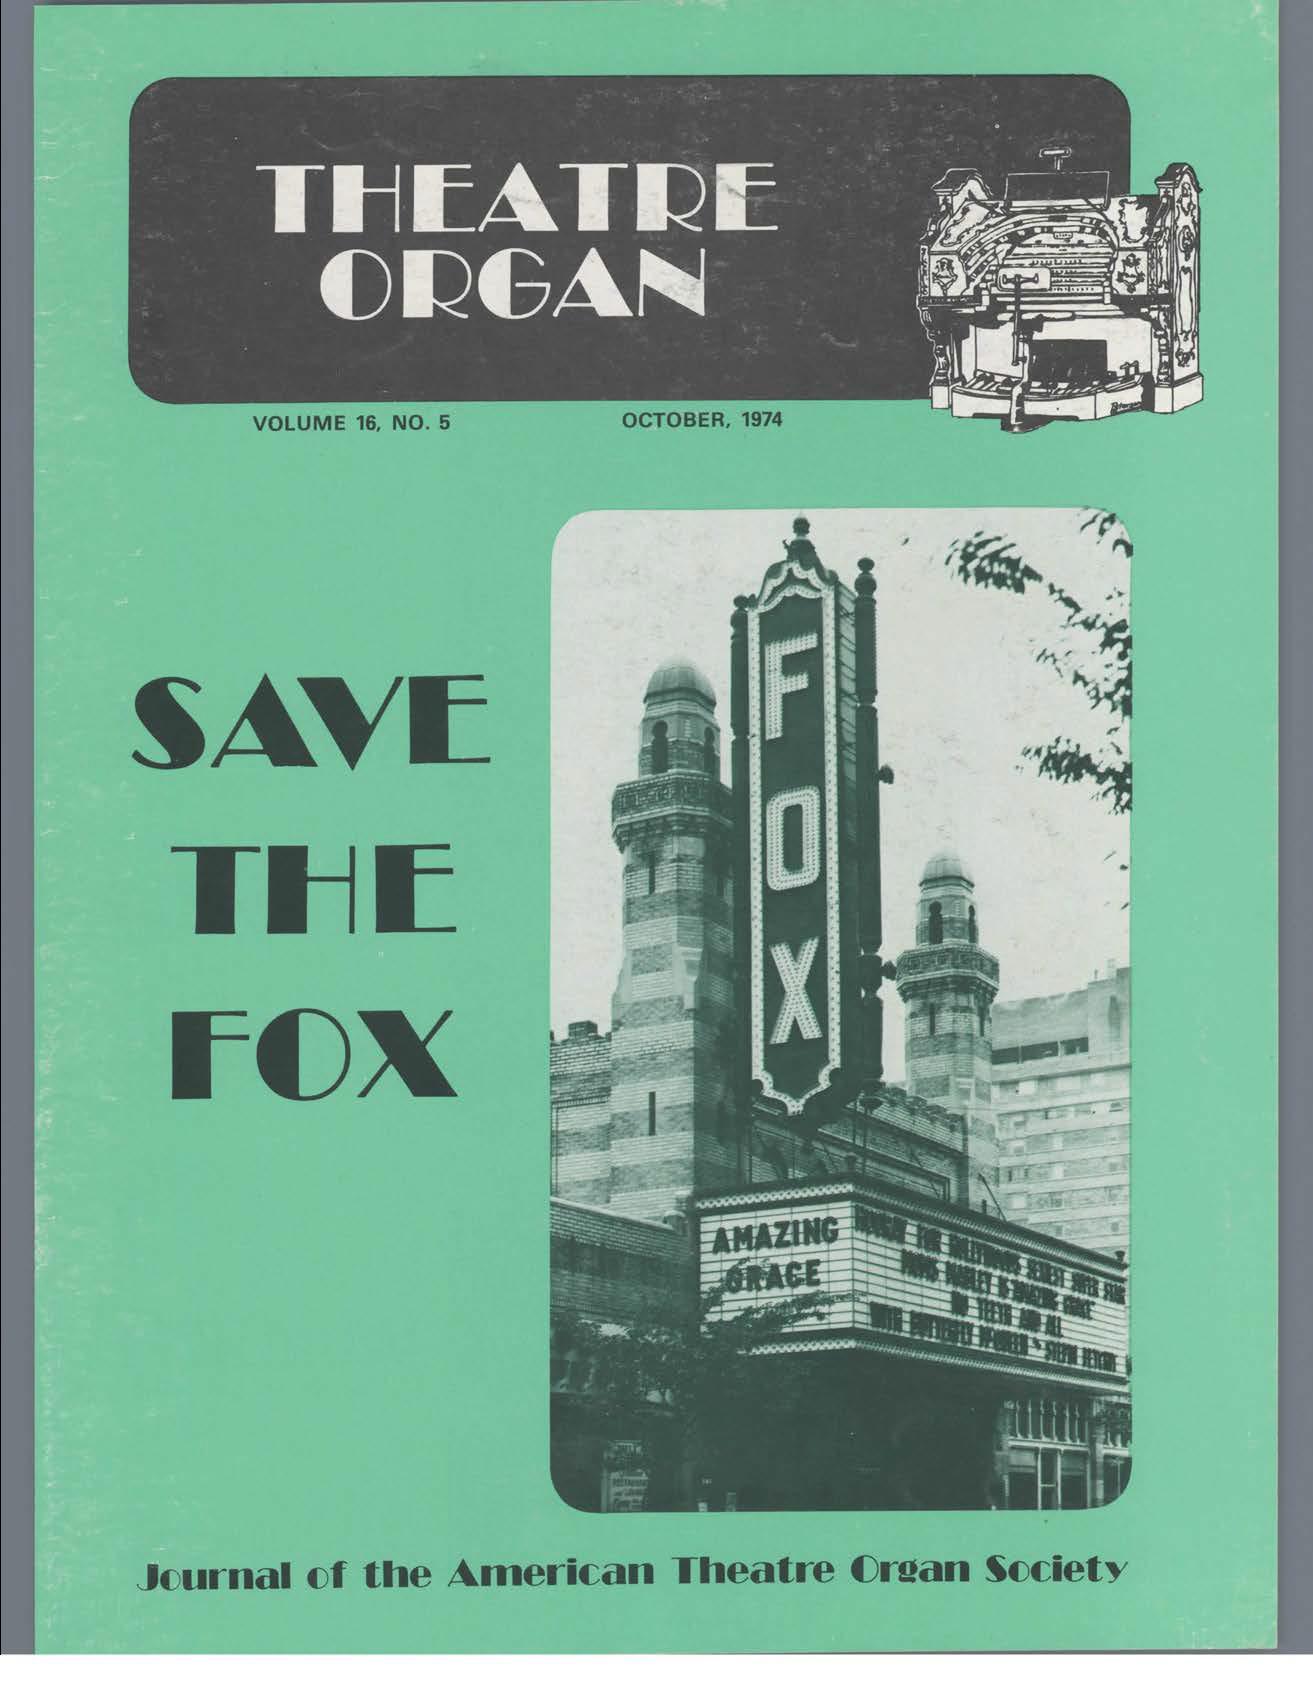 Theatre Organ, October 1974, Volume 16, Number 5